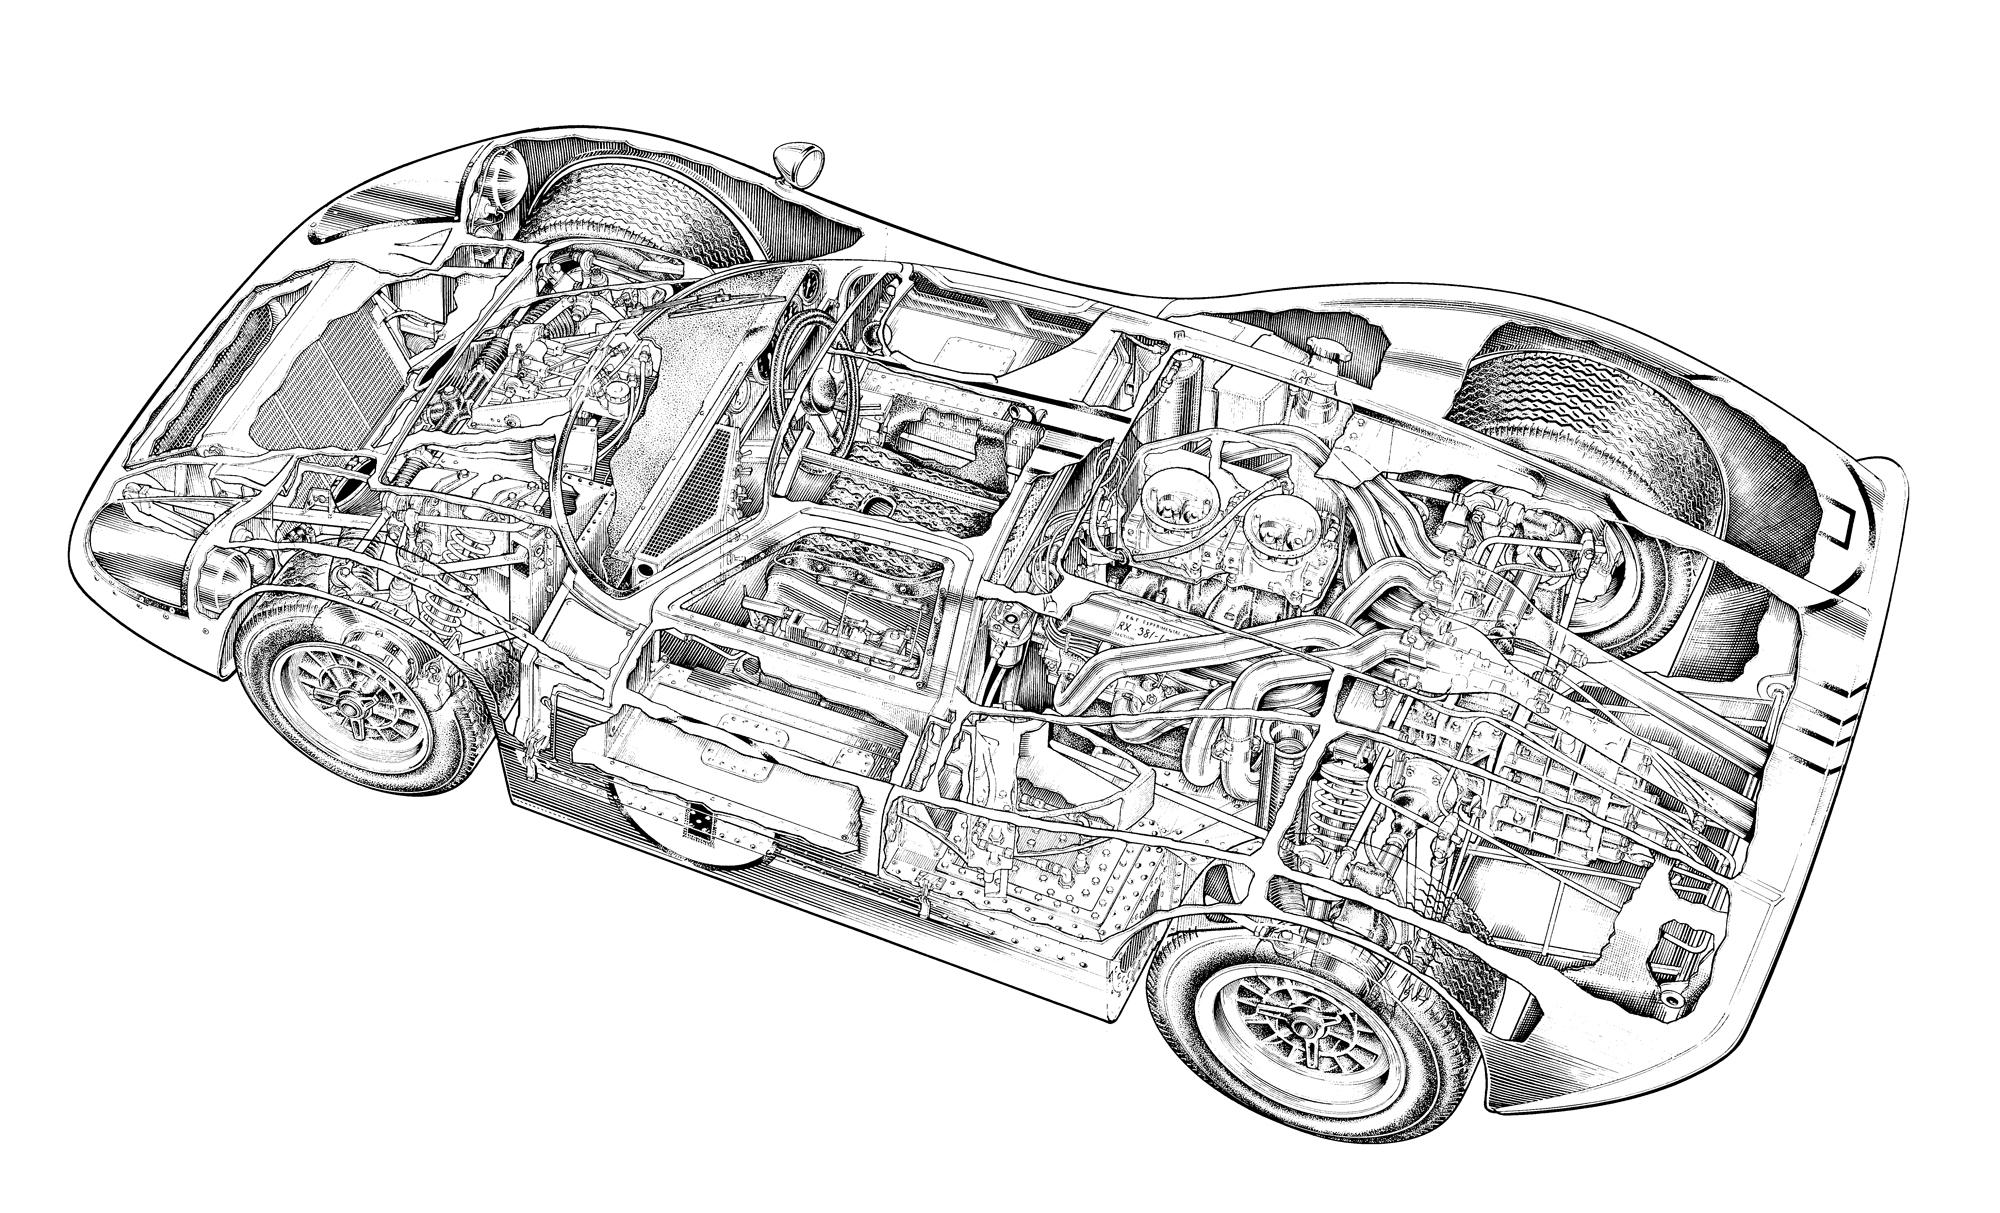 177 1063 28962 further Wiring Diagrams Acura Rsx Fog Light Diagram as well Raio X Tinta Pincel 12 Modelos Historicos furthermore Maserati Quattroporte 4 2l Boite F1 2003 Interior also Line Drawings. on maserati seats